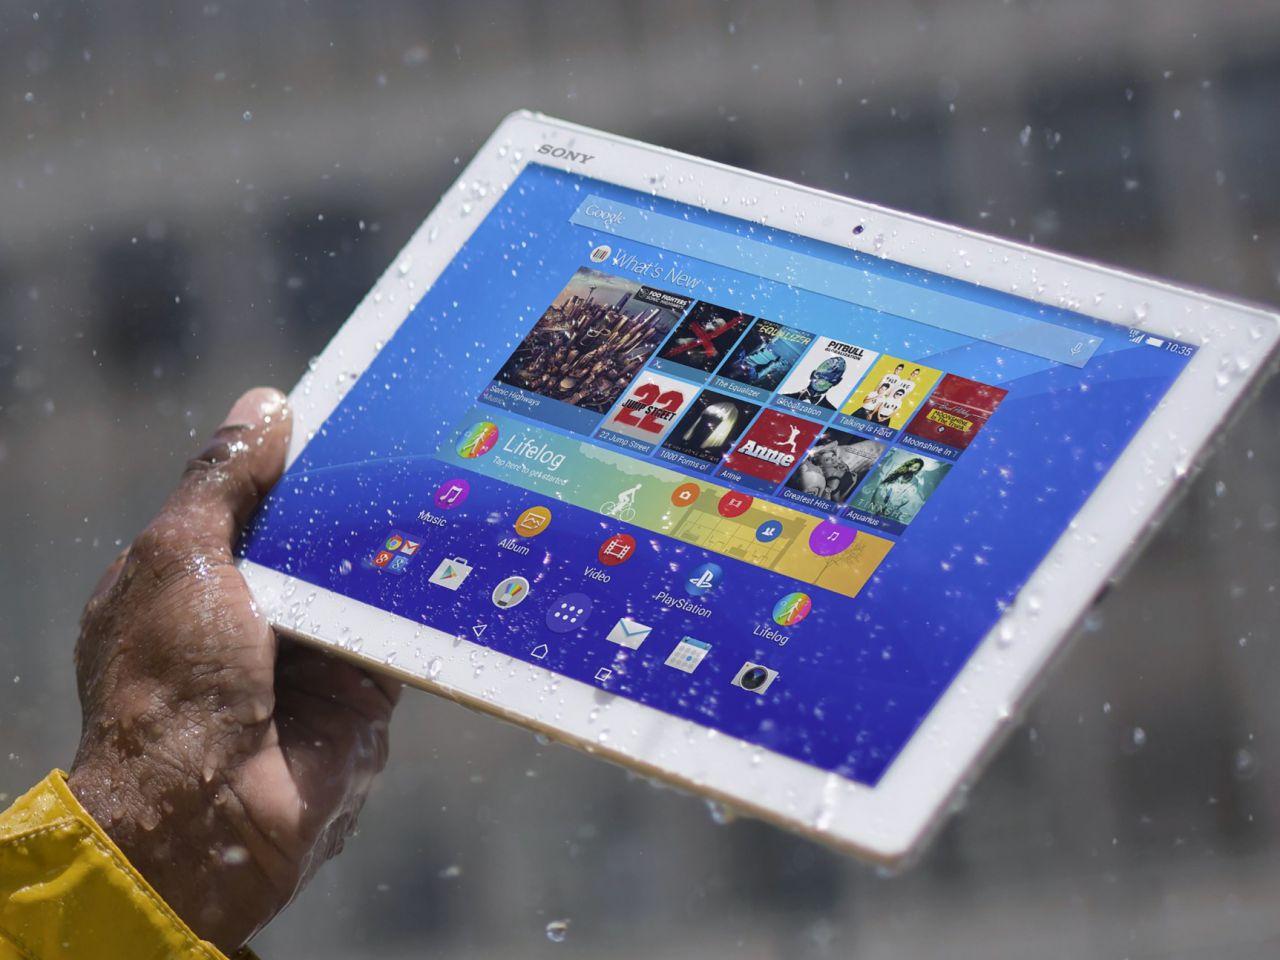 Sony Xperia Z4 Tablet MediaWorld